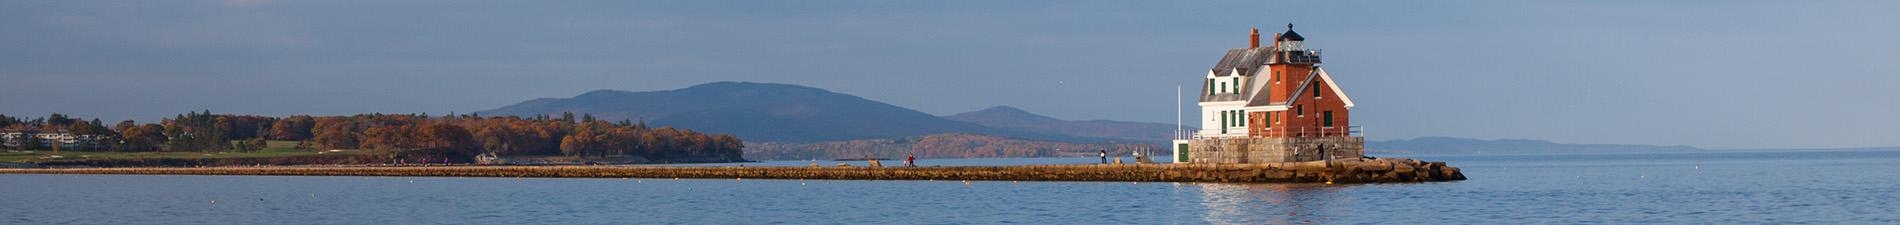 Rockland Harbor Breakwater, Rockland, Maine